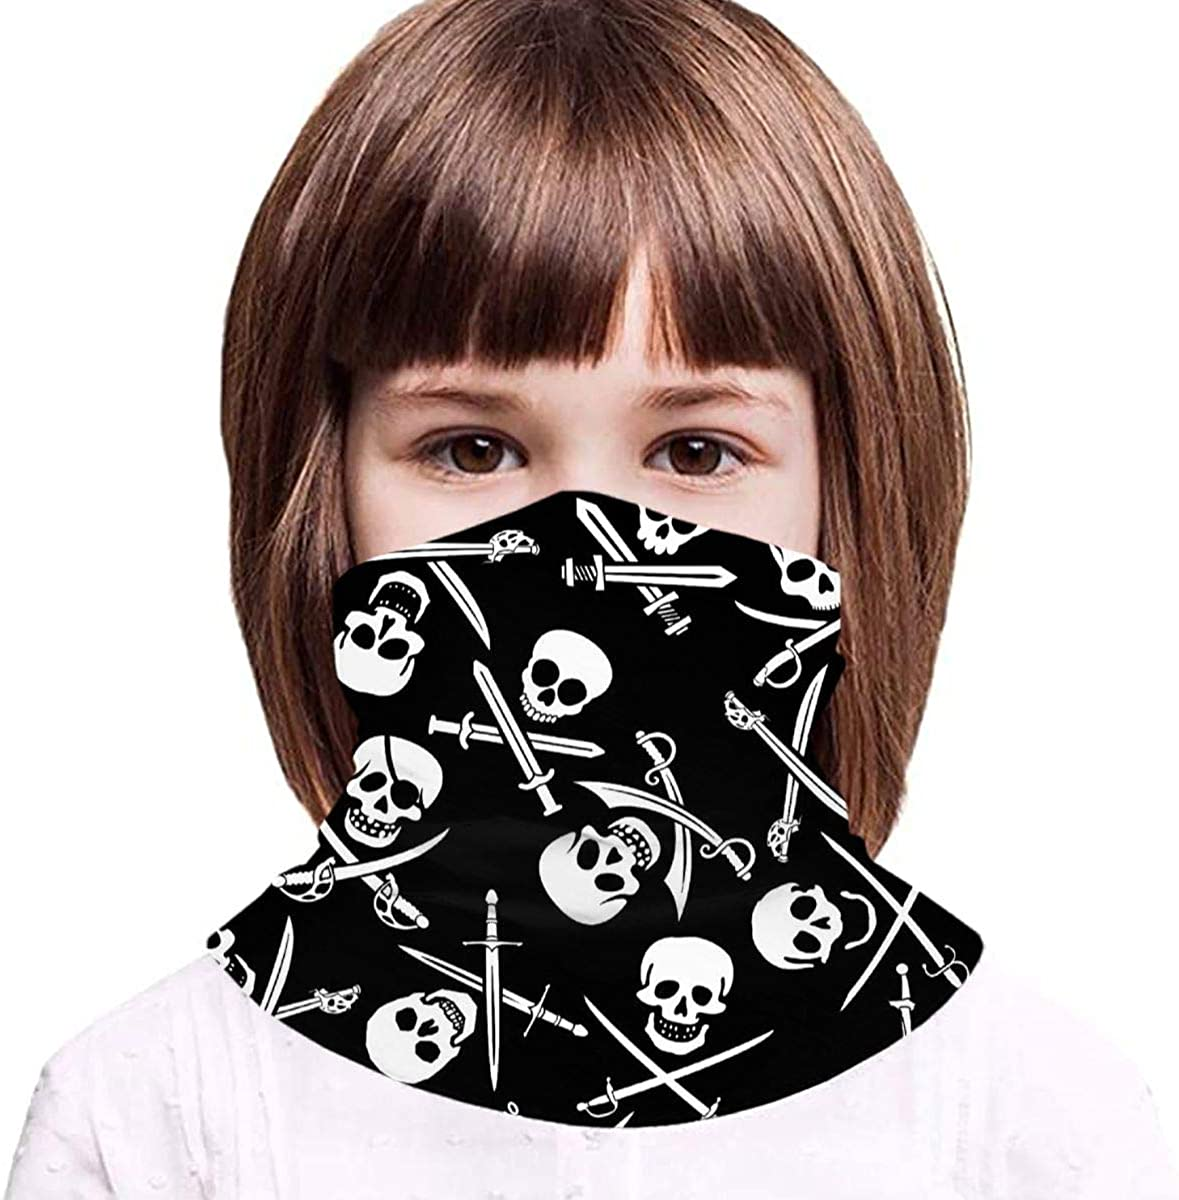 Skull and Crossbones Youth Novelty Neck Gaiter Bandana Headbands Kids Face Scarf Balaclavas for Outdoor